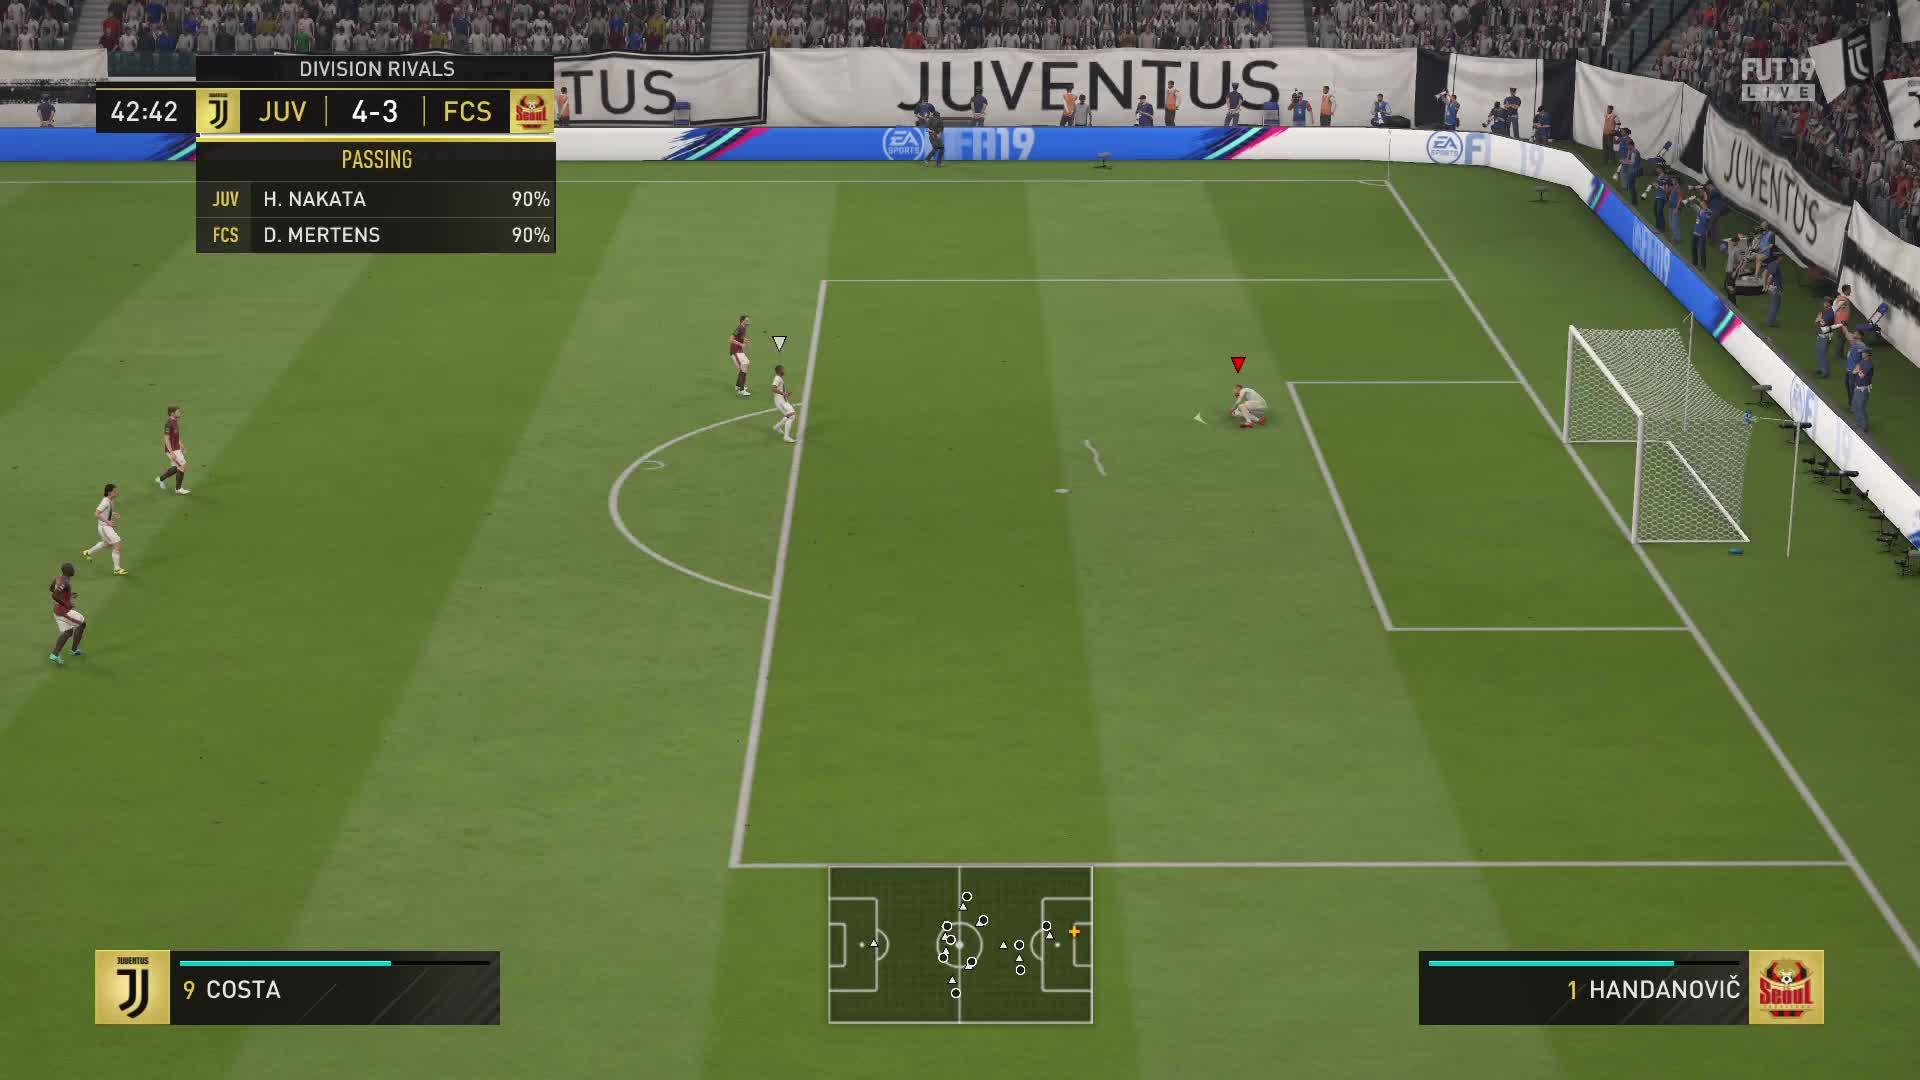 #ps4share, fifa, fifa 19, gaming, jamie lee, playstation 4, sony interactive entertainment, FIFA 19_20190522004343 GIFs